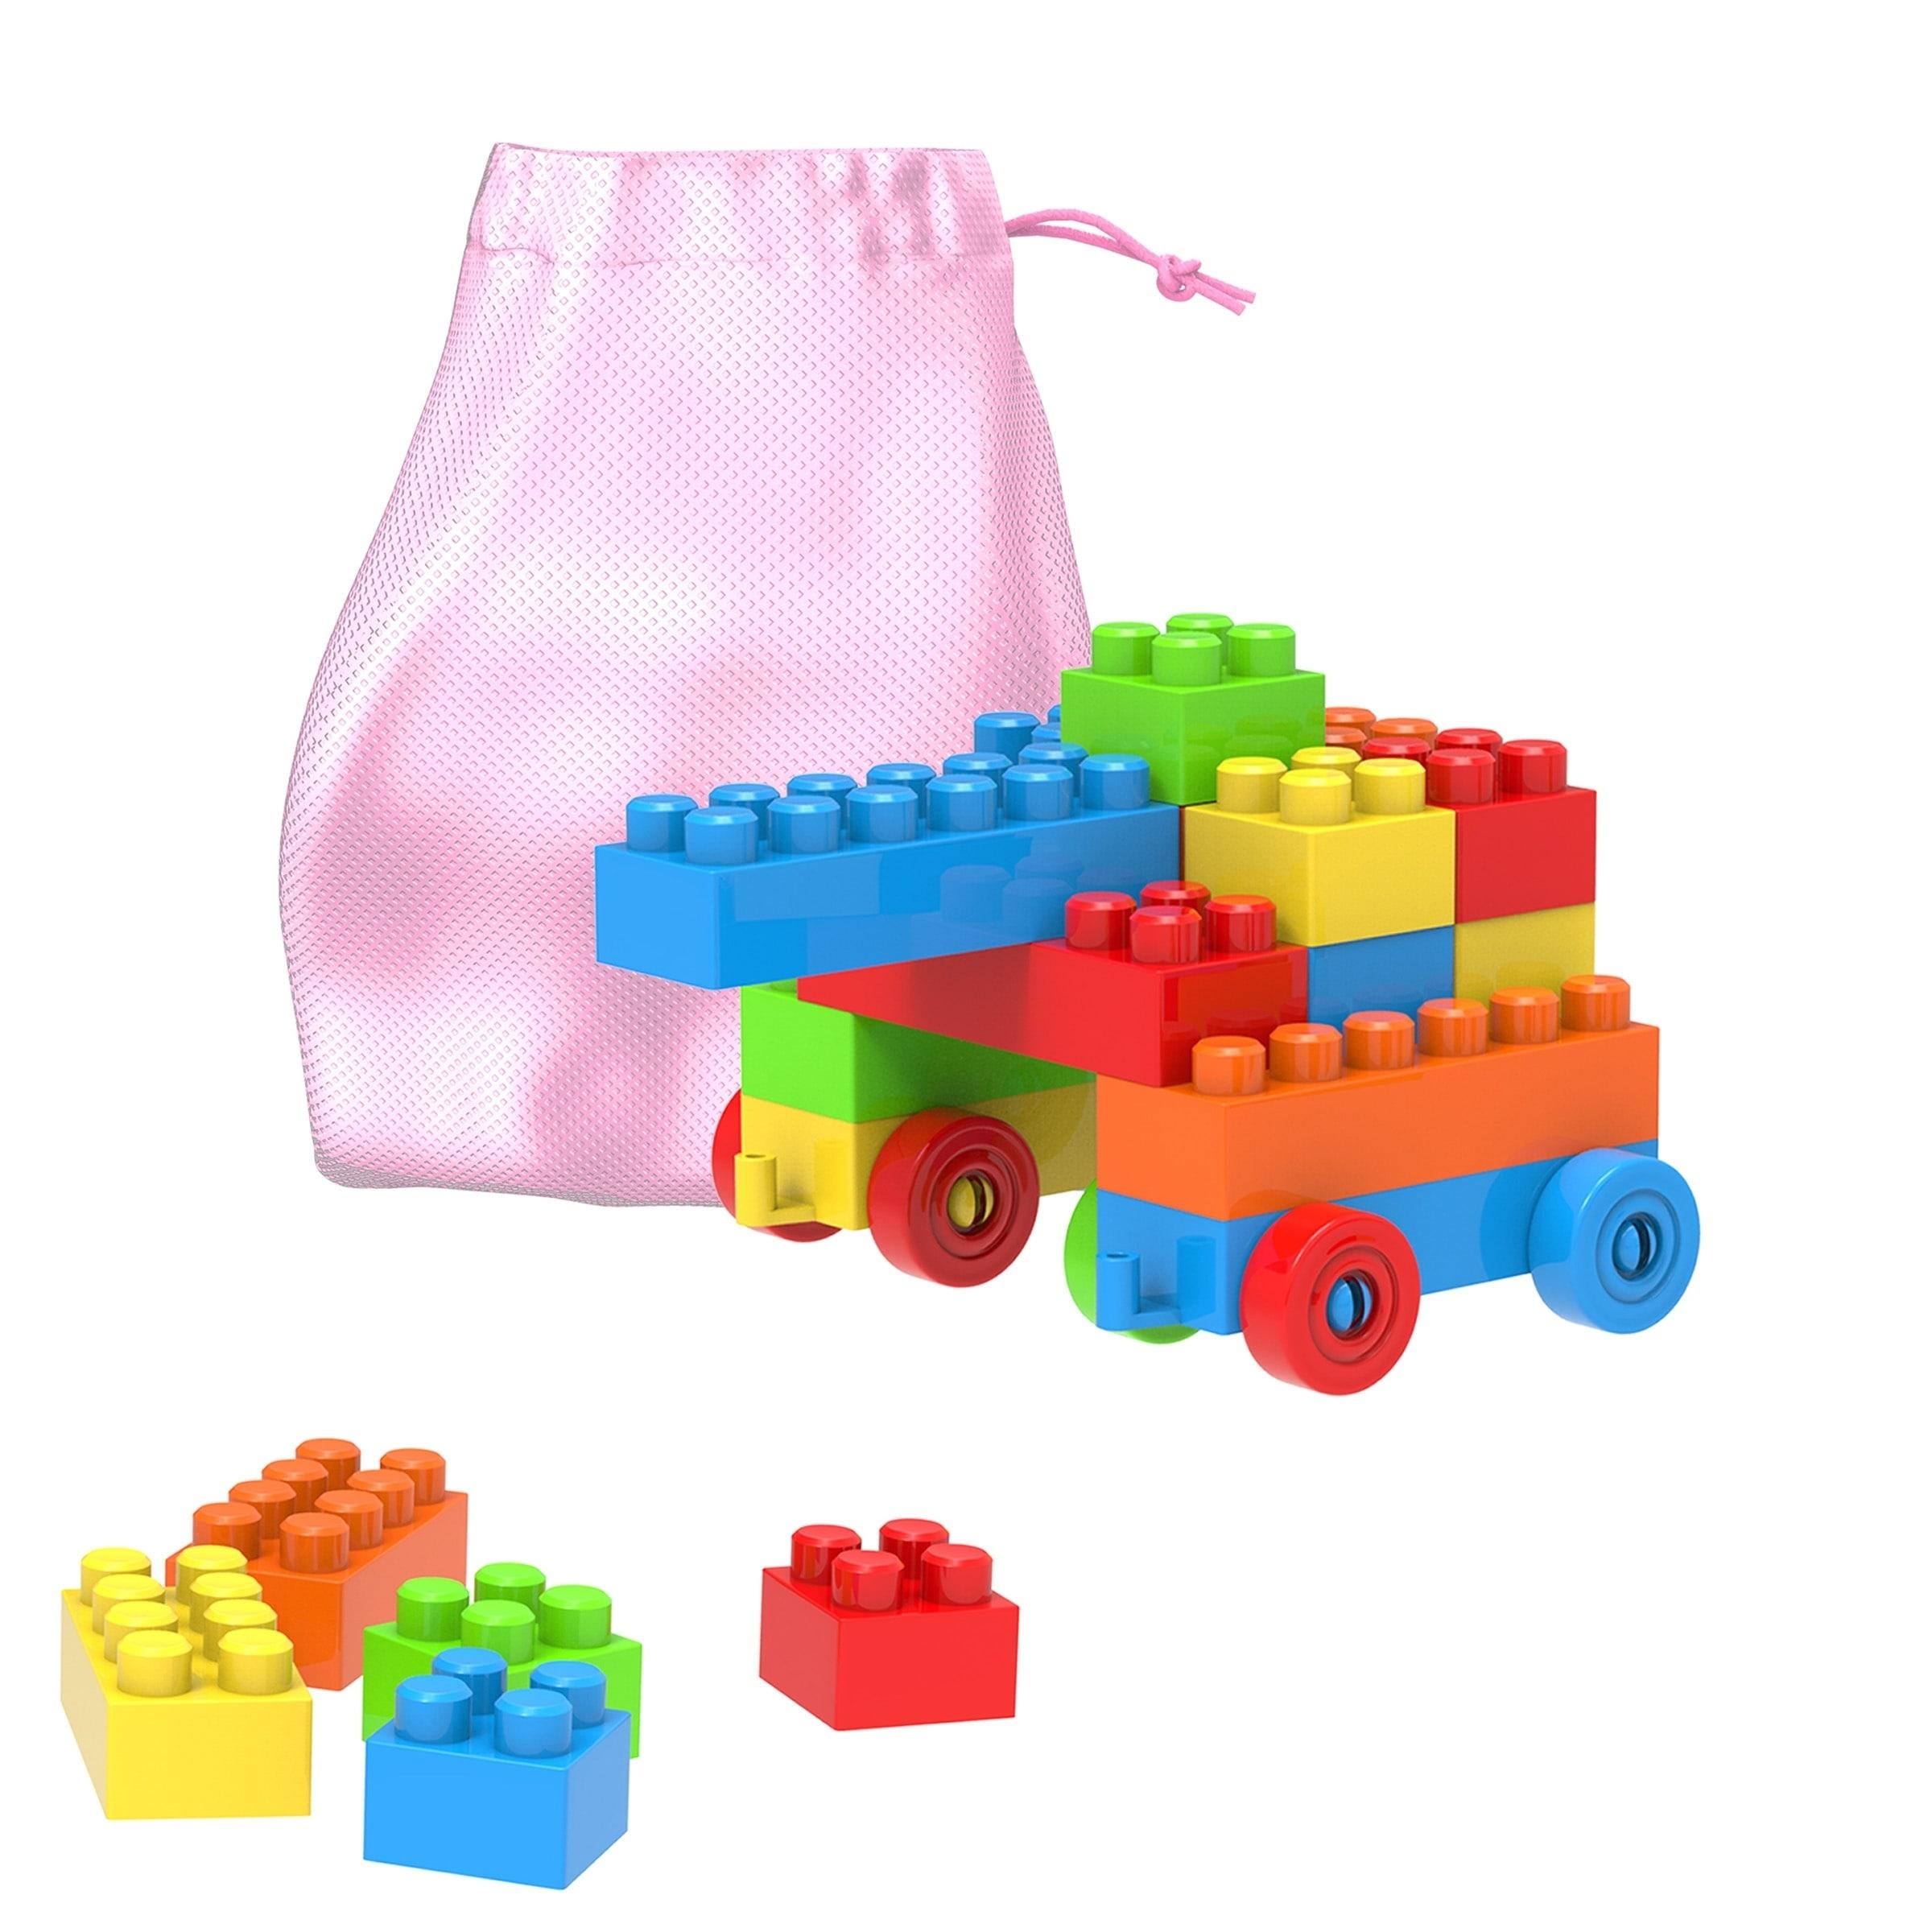 dcae1ac0edc5 Shop Building Blocks-Classic 90 Piece Set with Storage Bag-Stacking ...